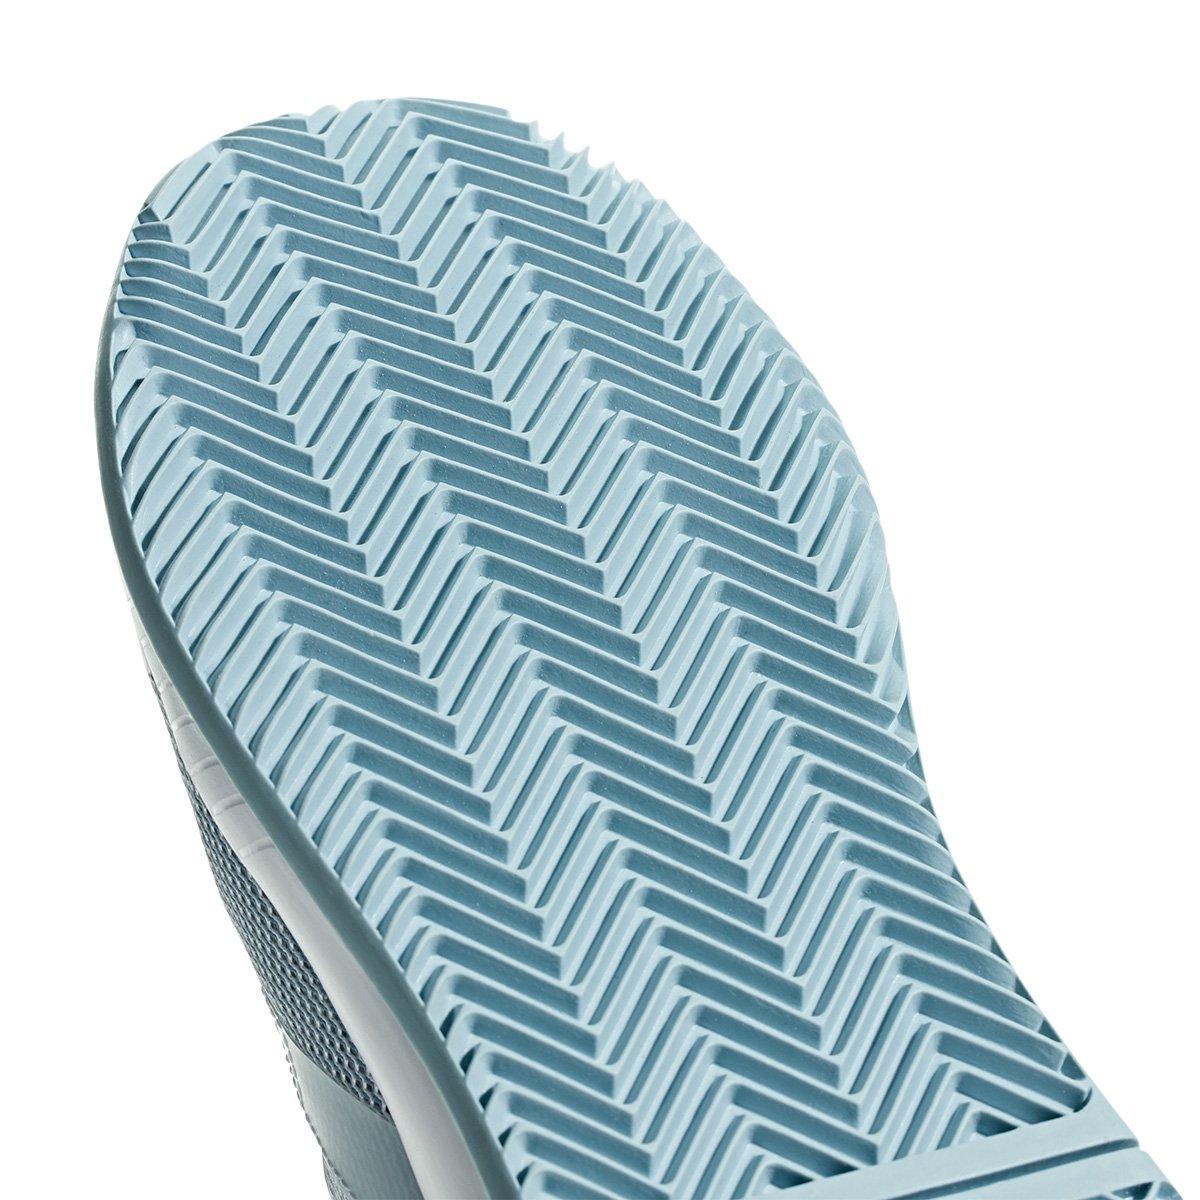 Tênis Adidas Adizero Defiant Bounce Feminino - Azul Claro e Branco ... 841003e808874